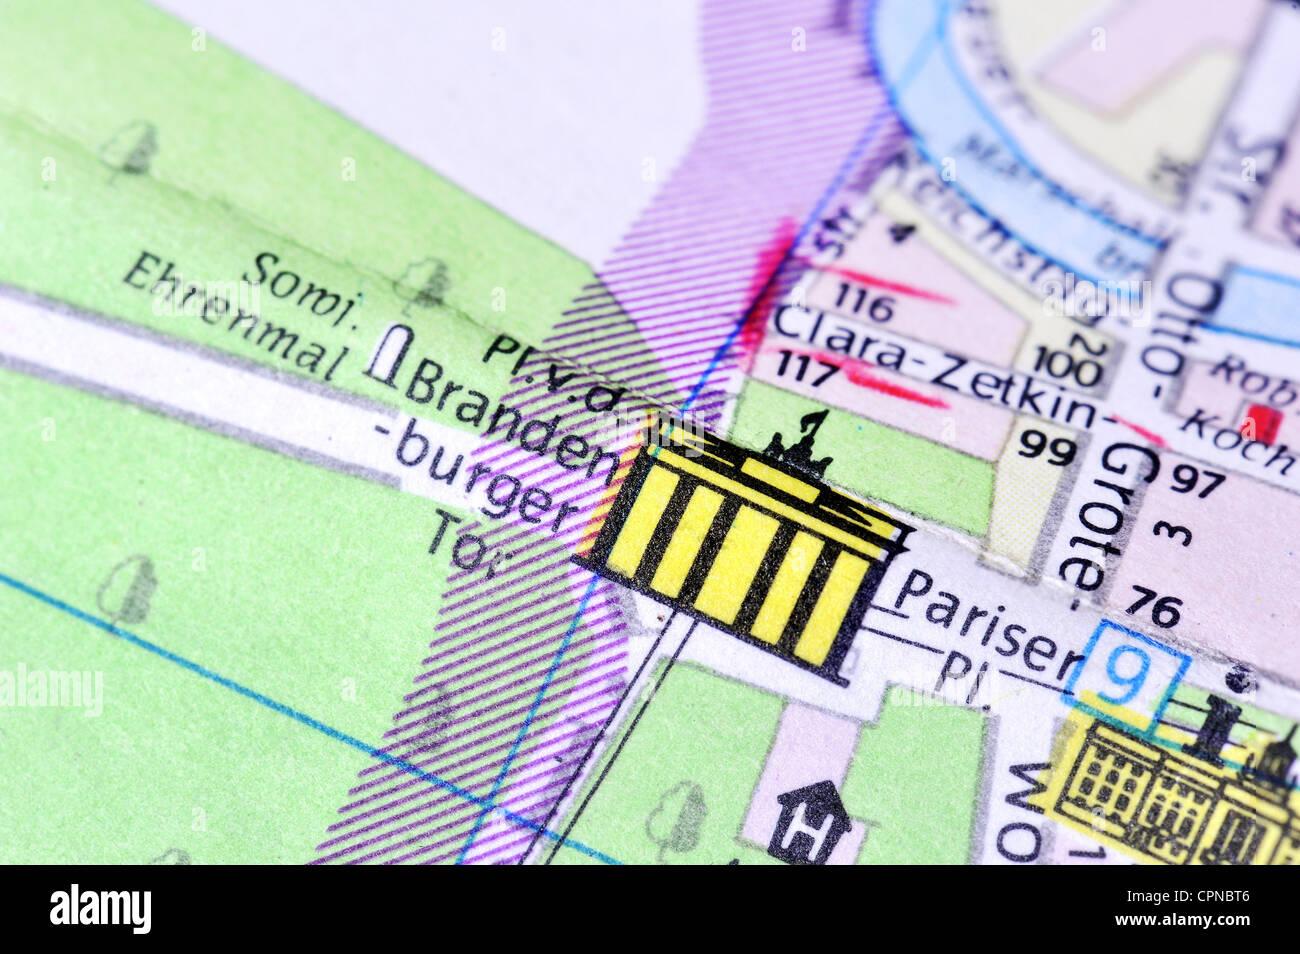 cartography city map Berlin detail Brandenburg Gate Pariser